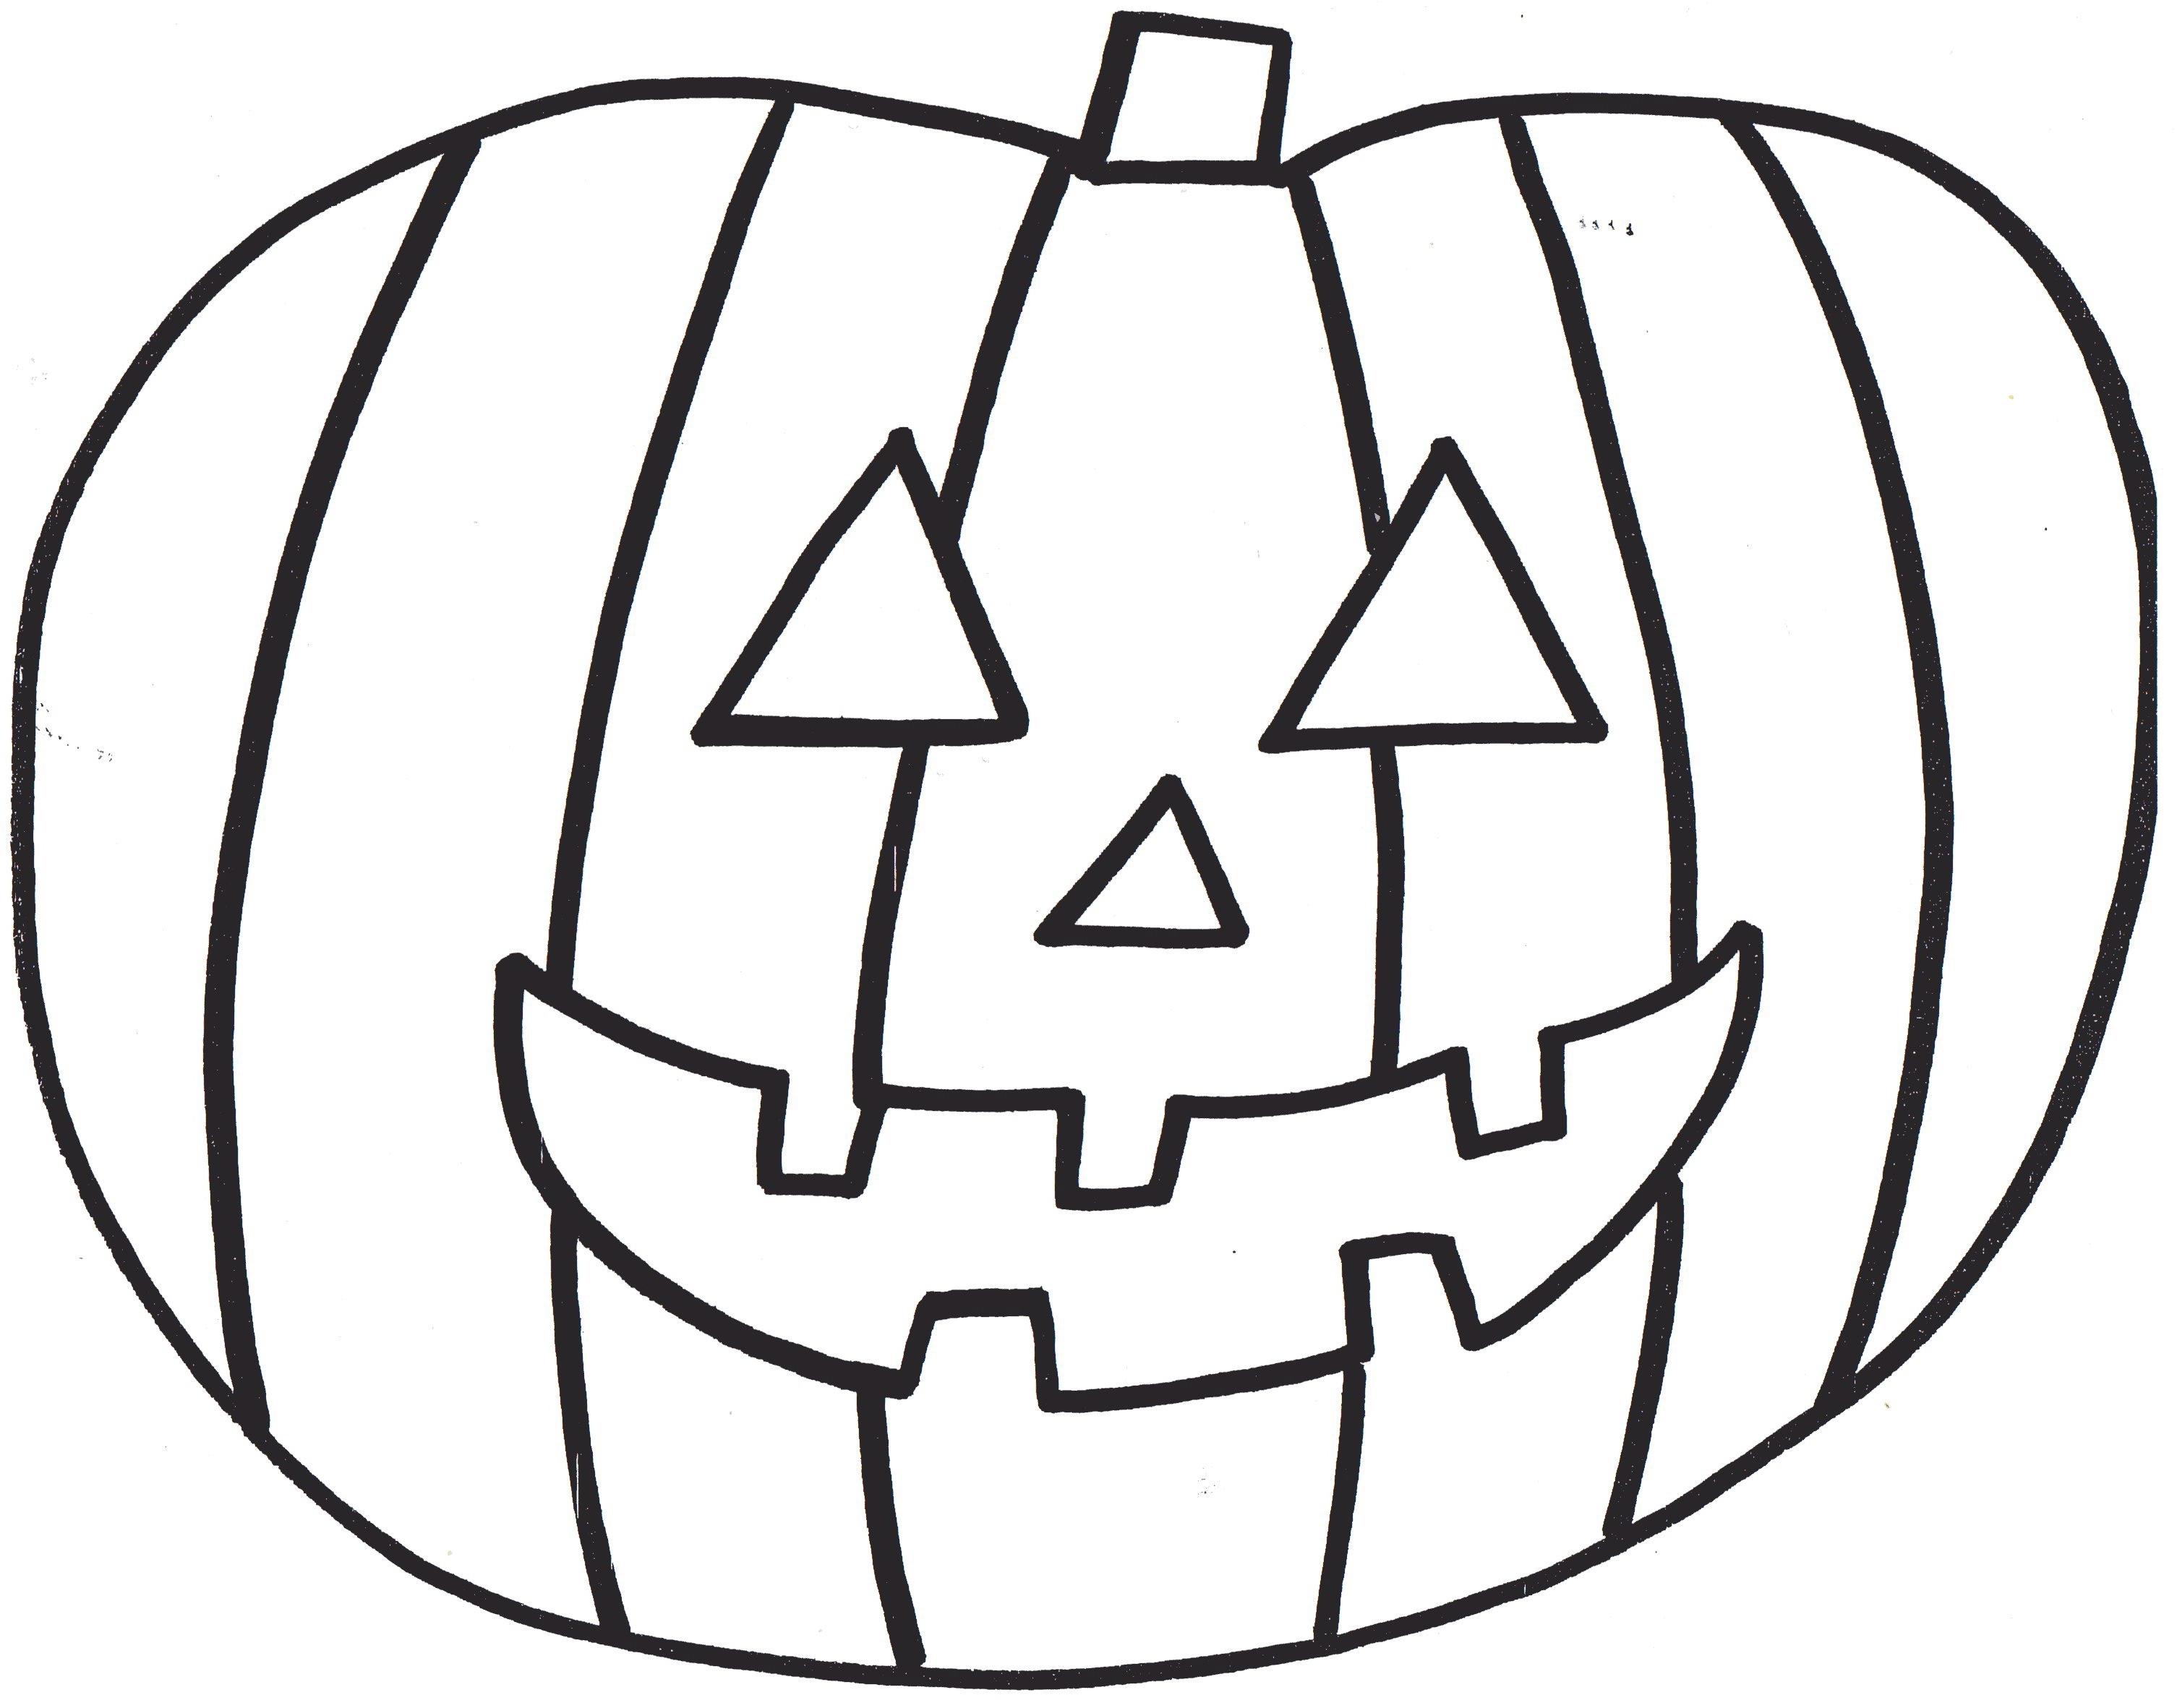 Halloween Pumpkin Coloring Pages Printables Coloring Pages Free Pumpkin Coloring Preschoolers At Printable